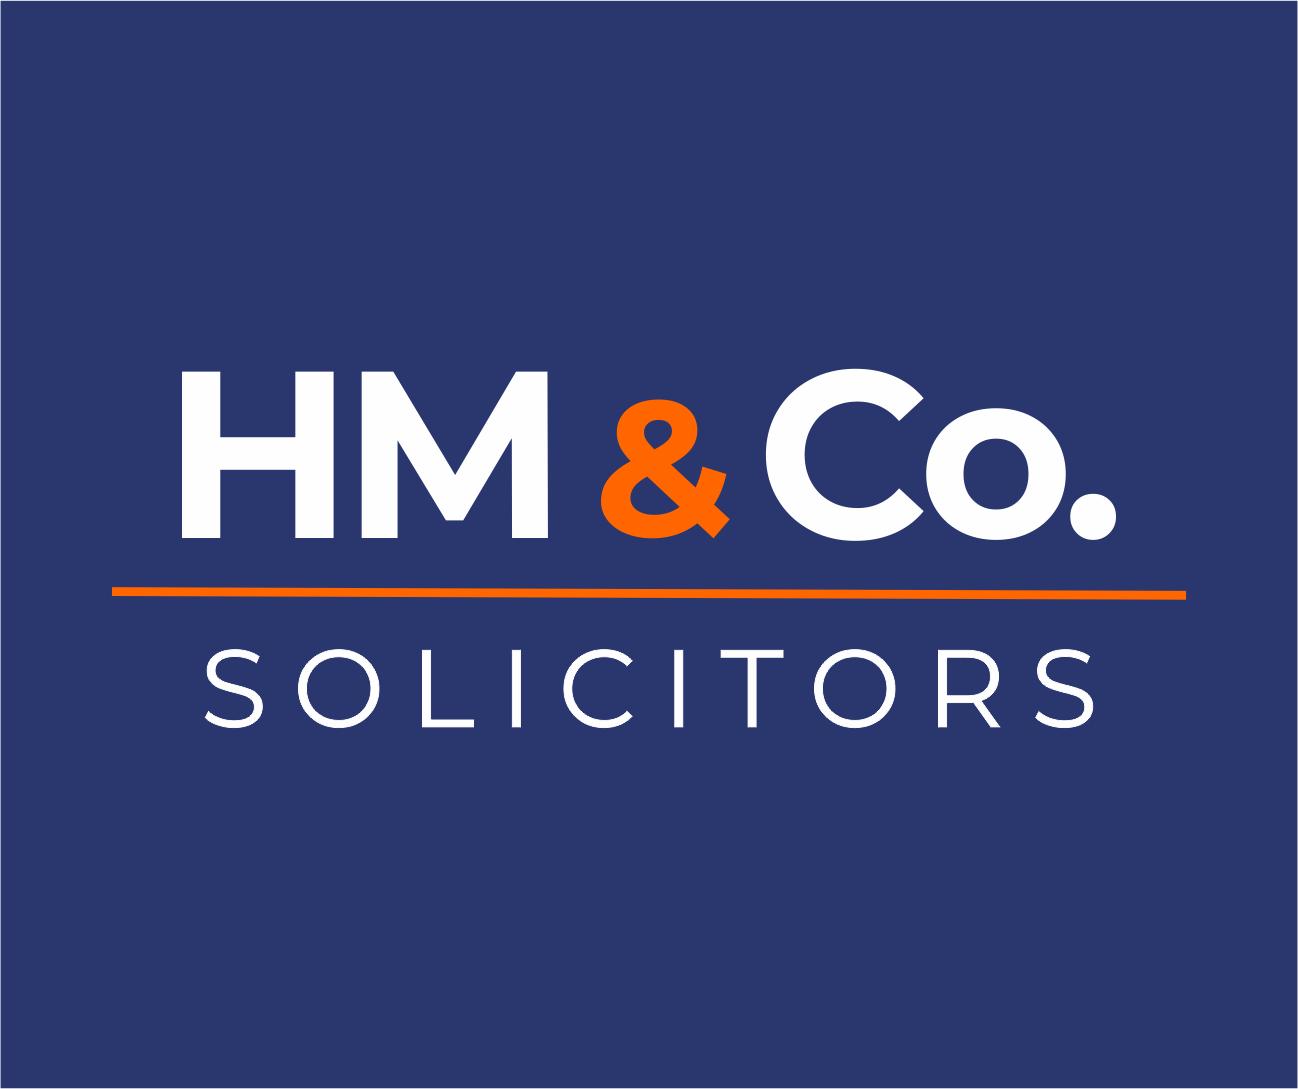 HM & Co. Solicitors logo